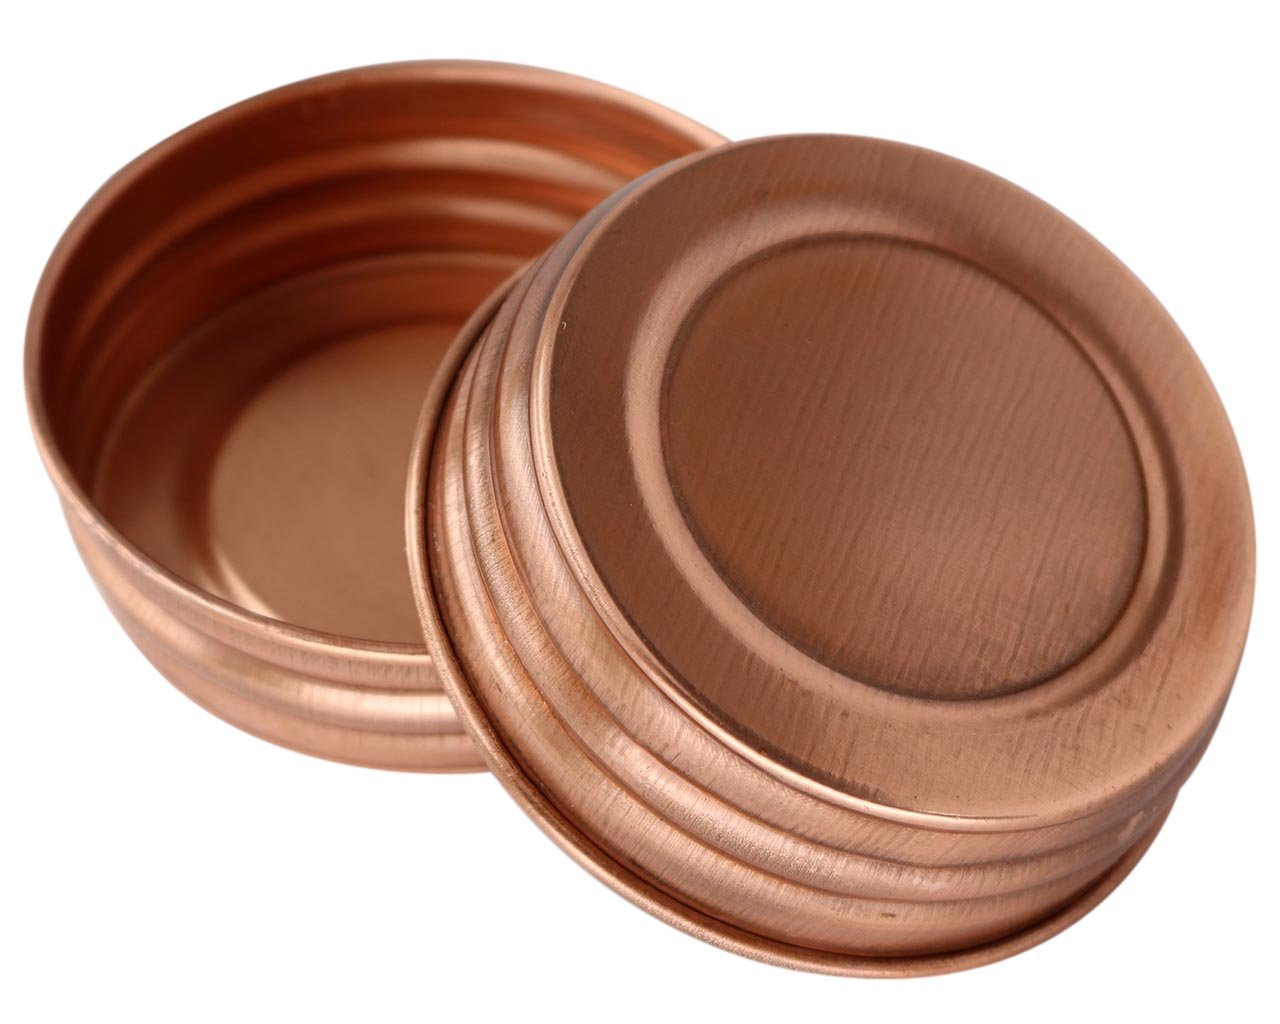 Shiny Copper Decorative Mason Jar Lids (4 Pack, Regular Mouth)